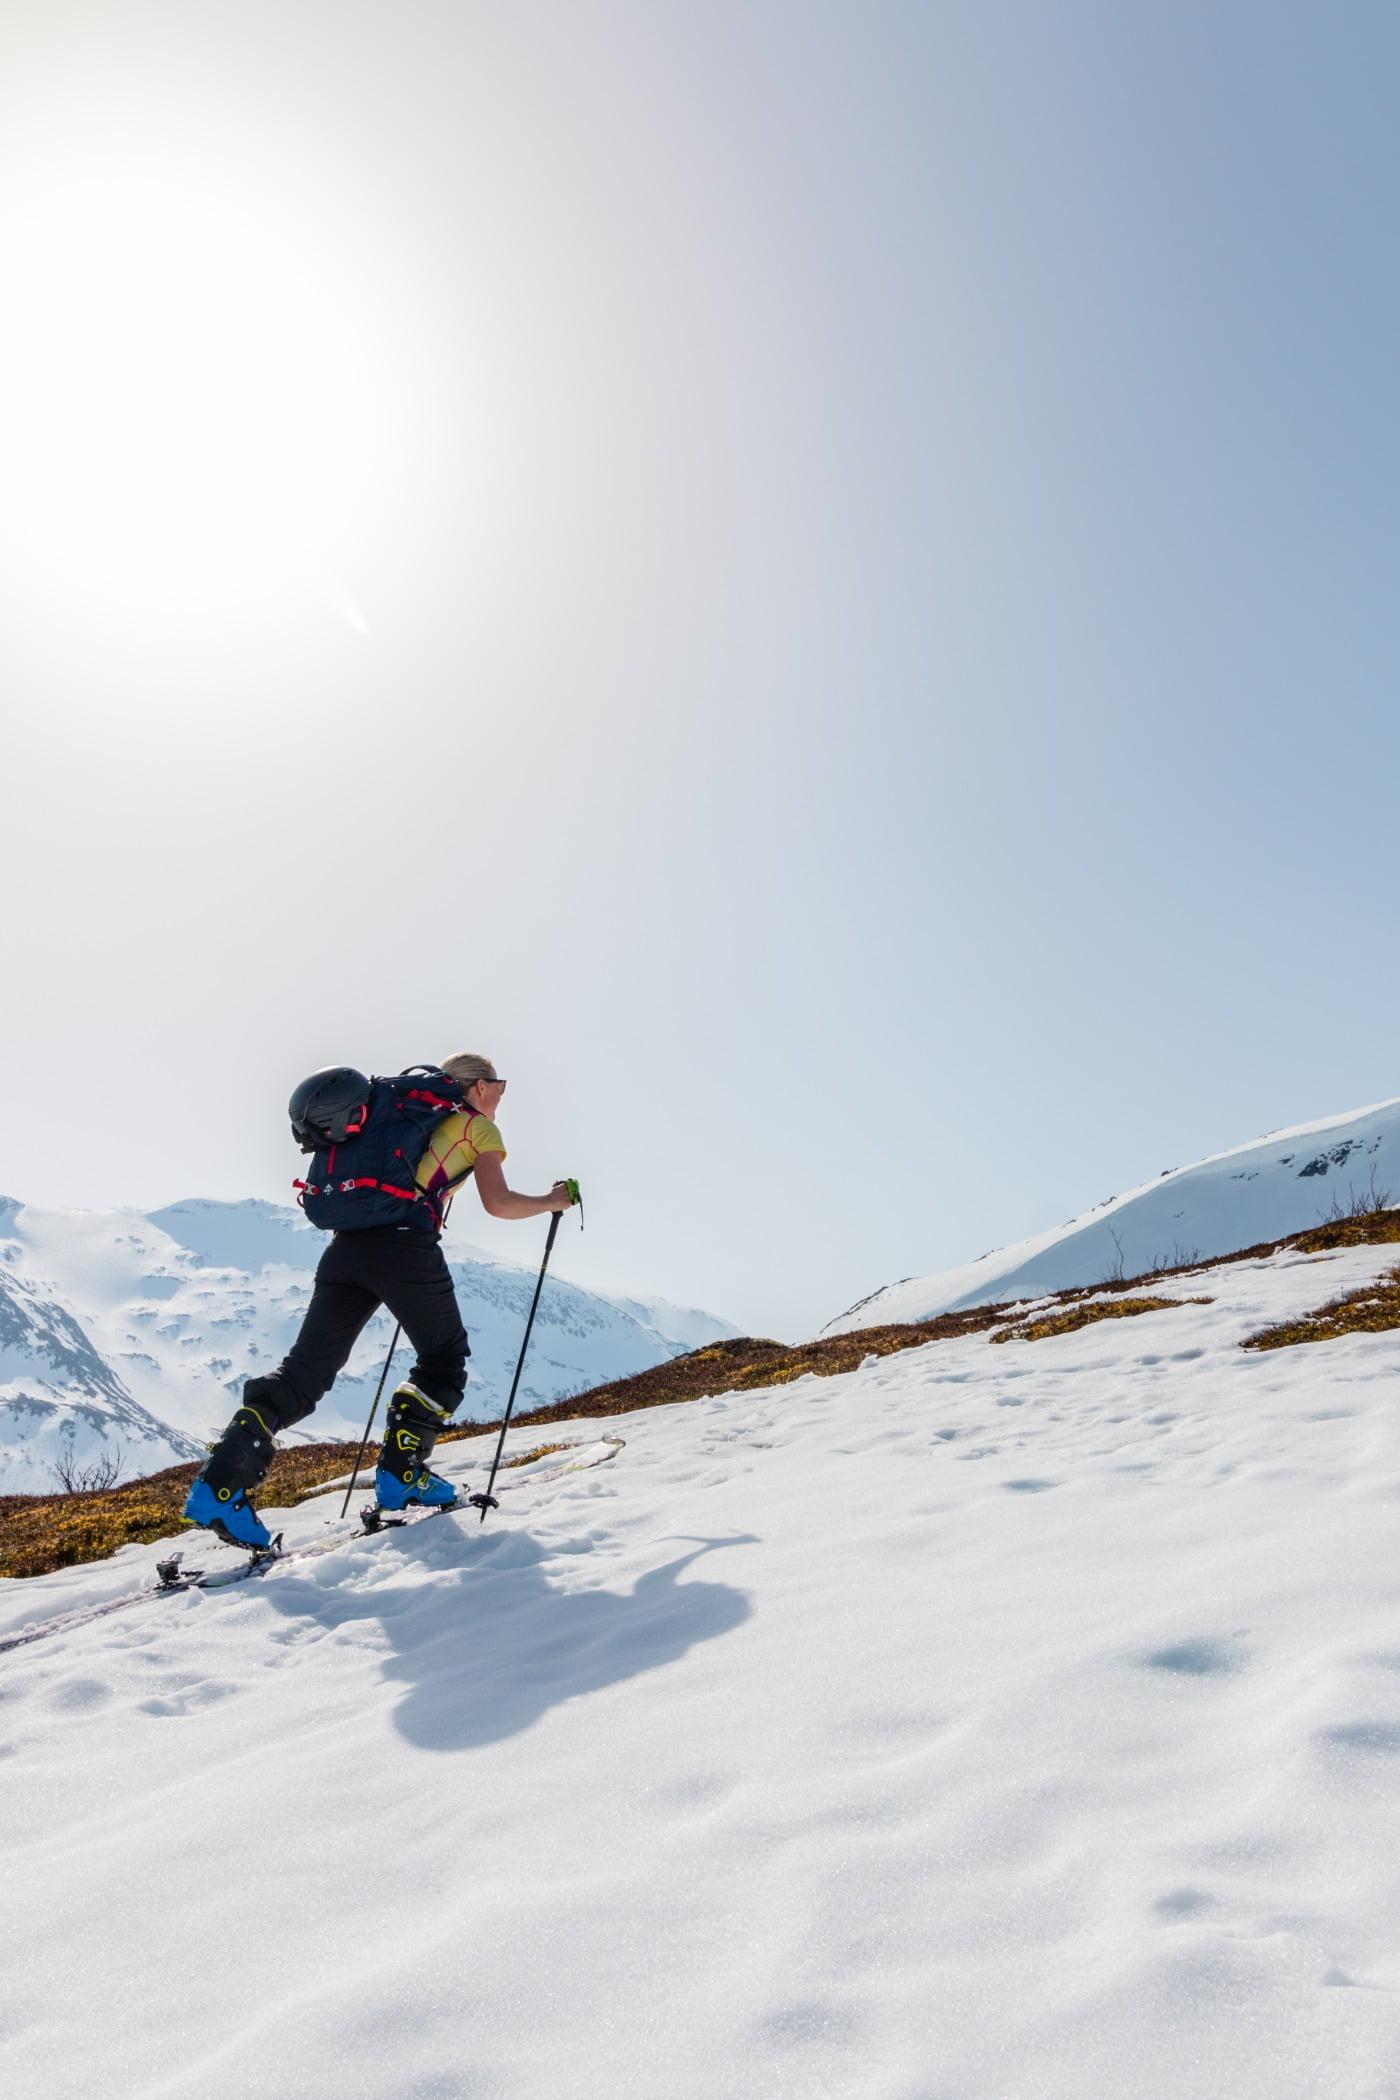 Outdoor recreation, Ski pole, Glacial landform, Winter sport, Sports equipment, Skier, Slope